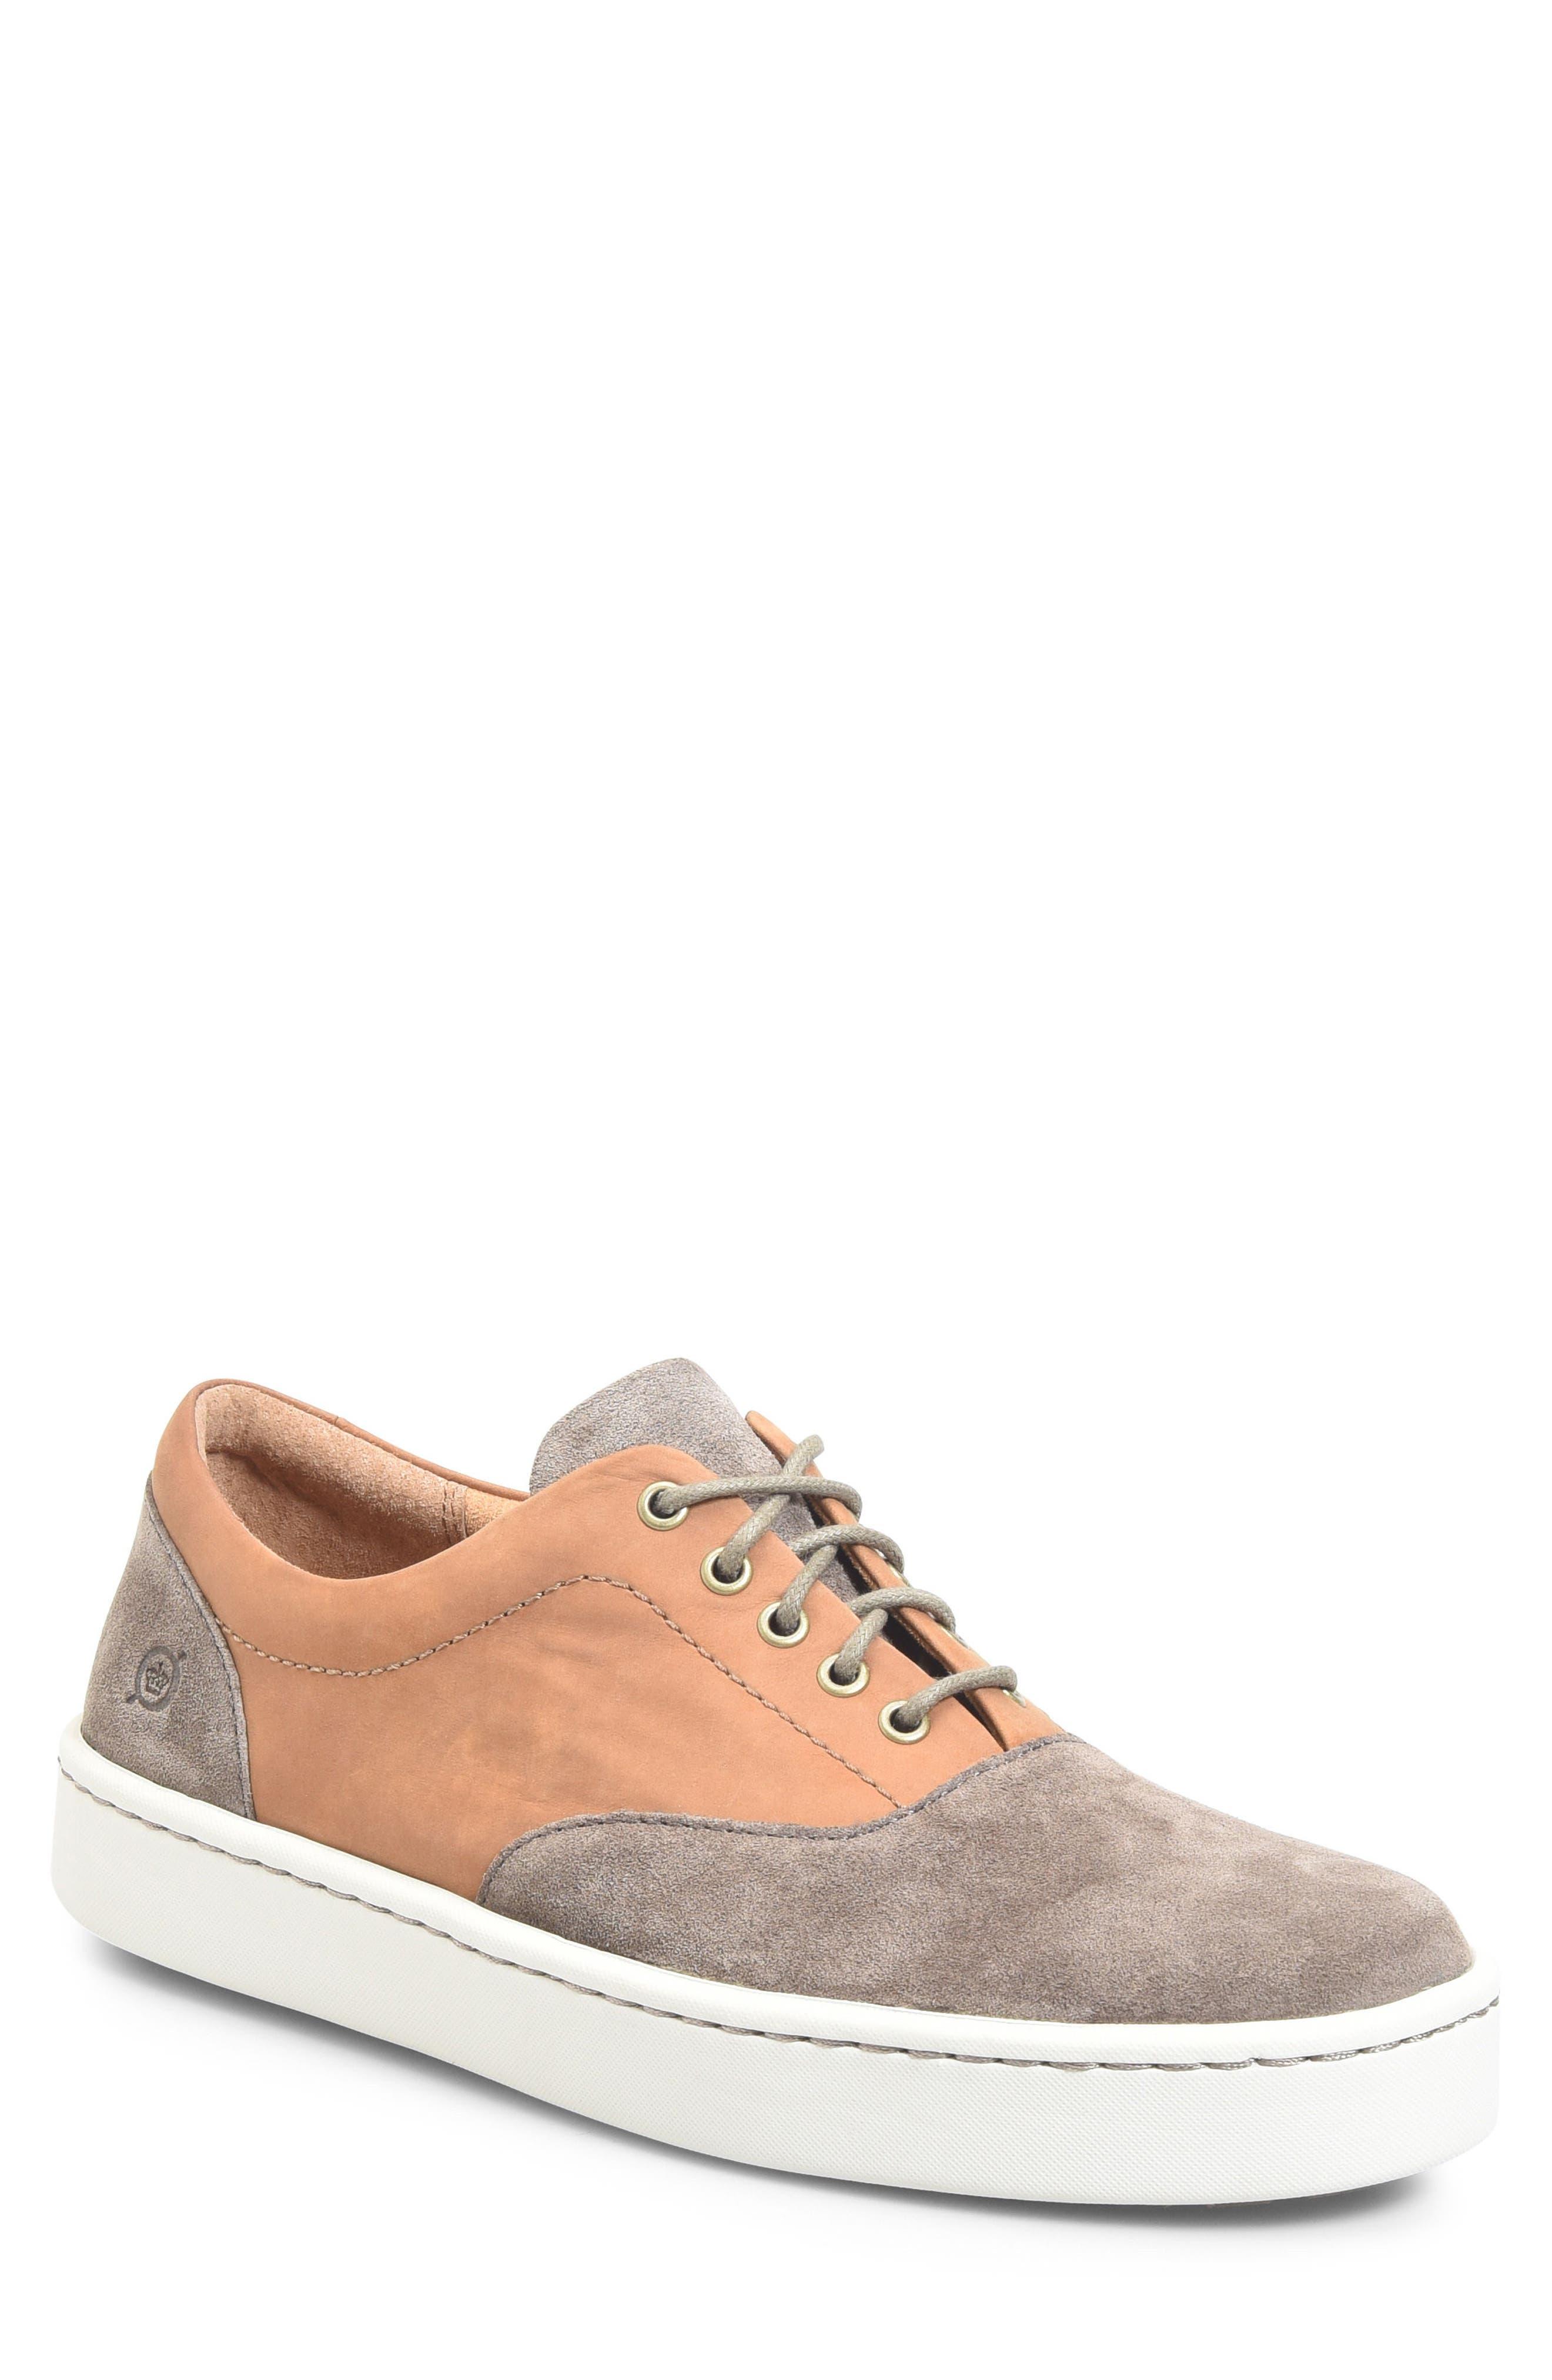 Keystone Low Top Sneaker,                             Main thumbnail 2, color,